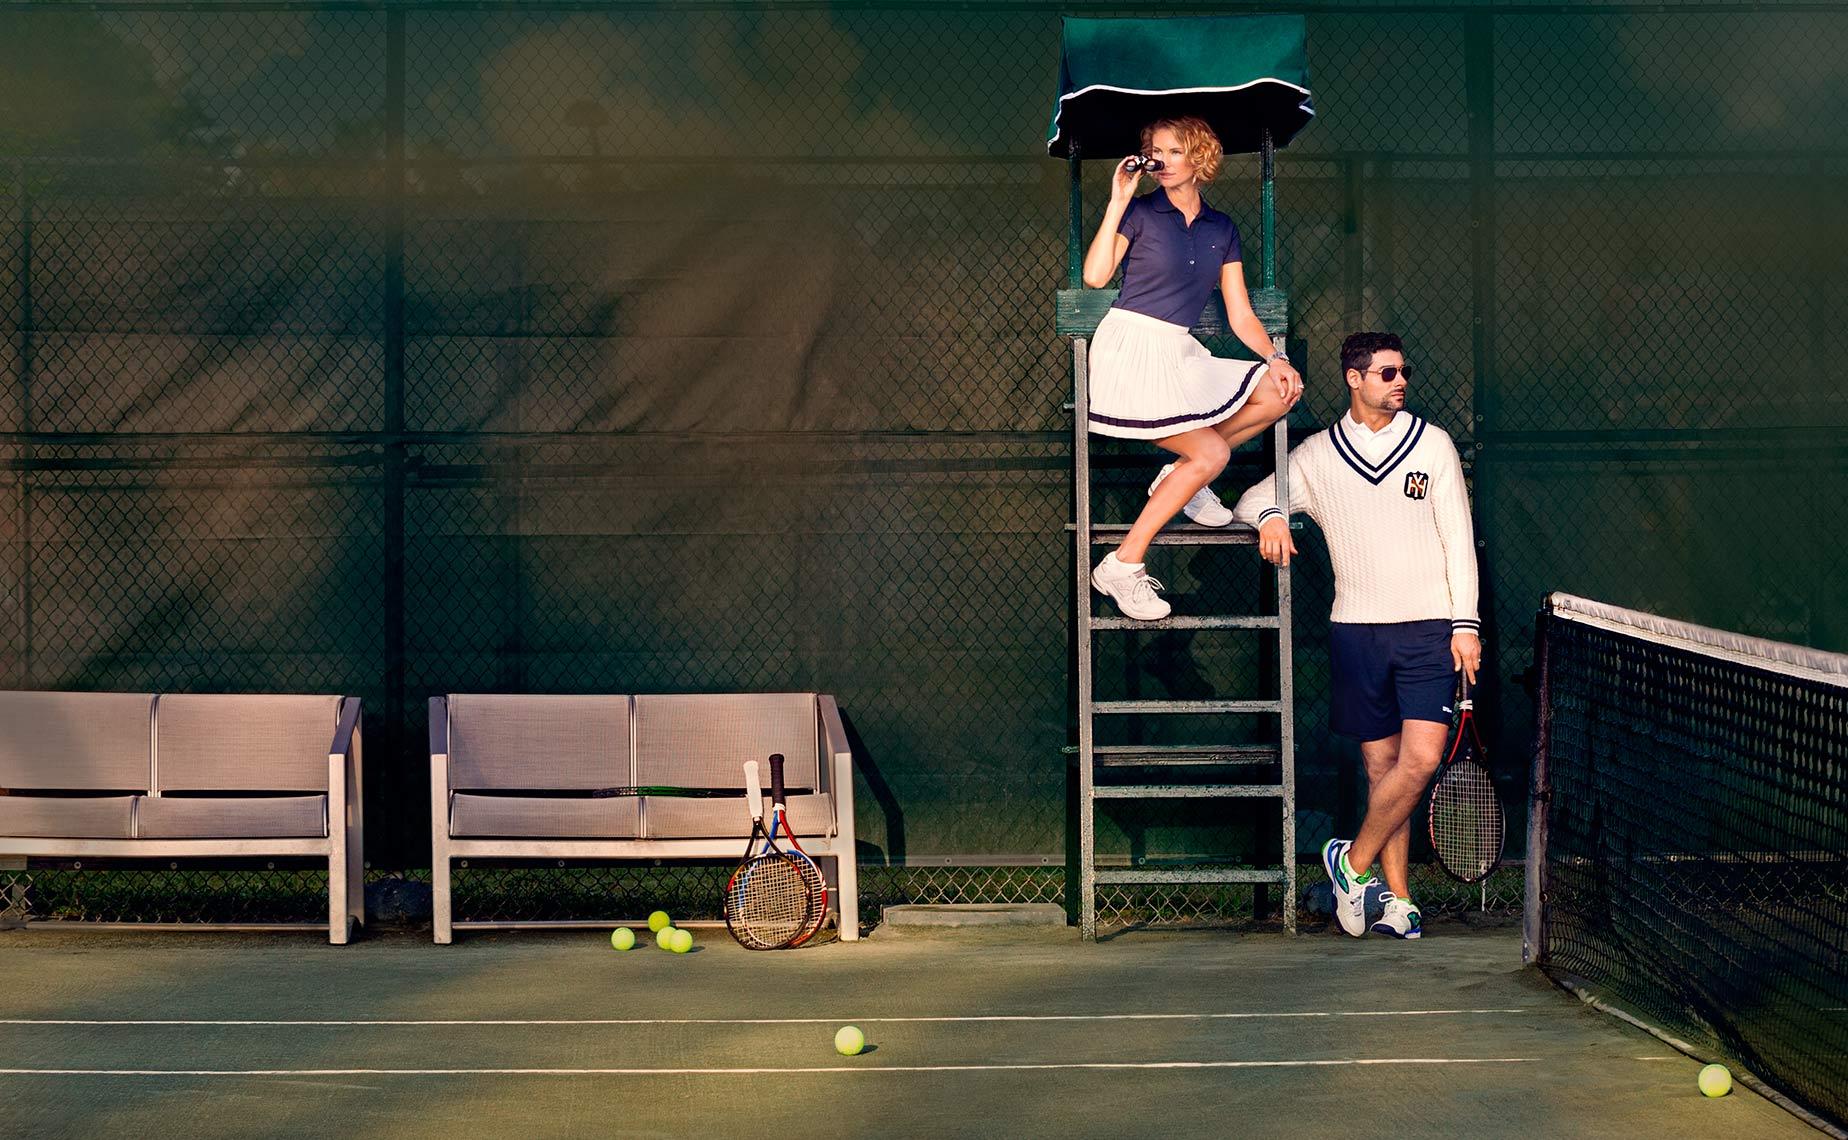 Tennis-0135_r3flat_gkFinal_C2.jpg